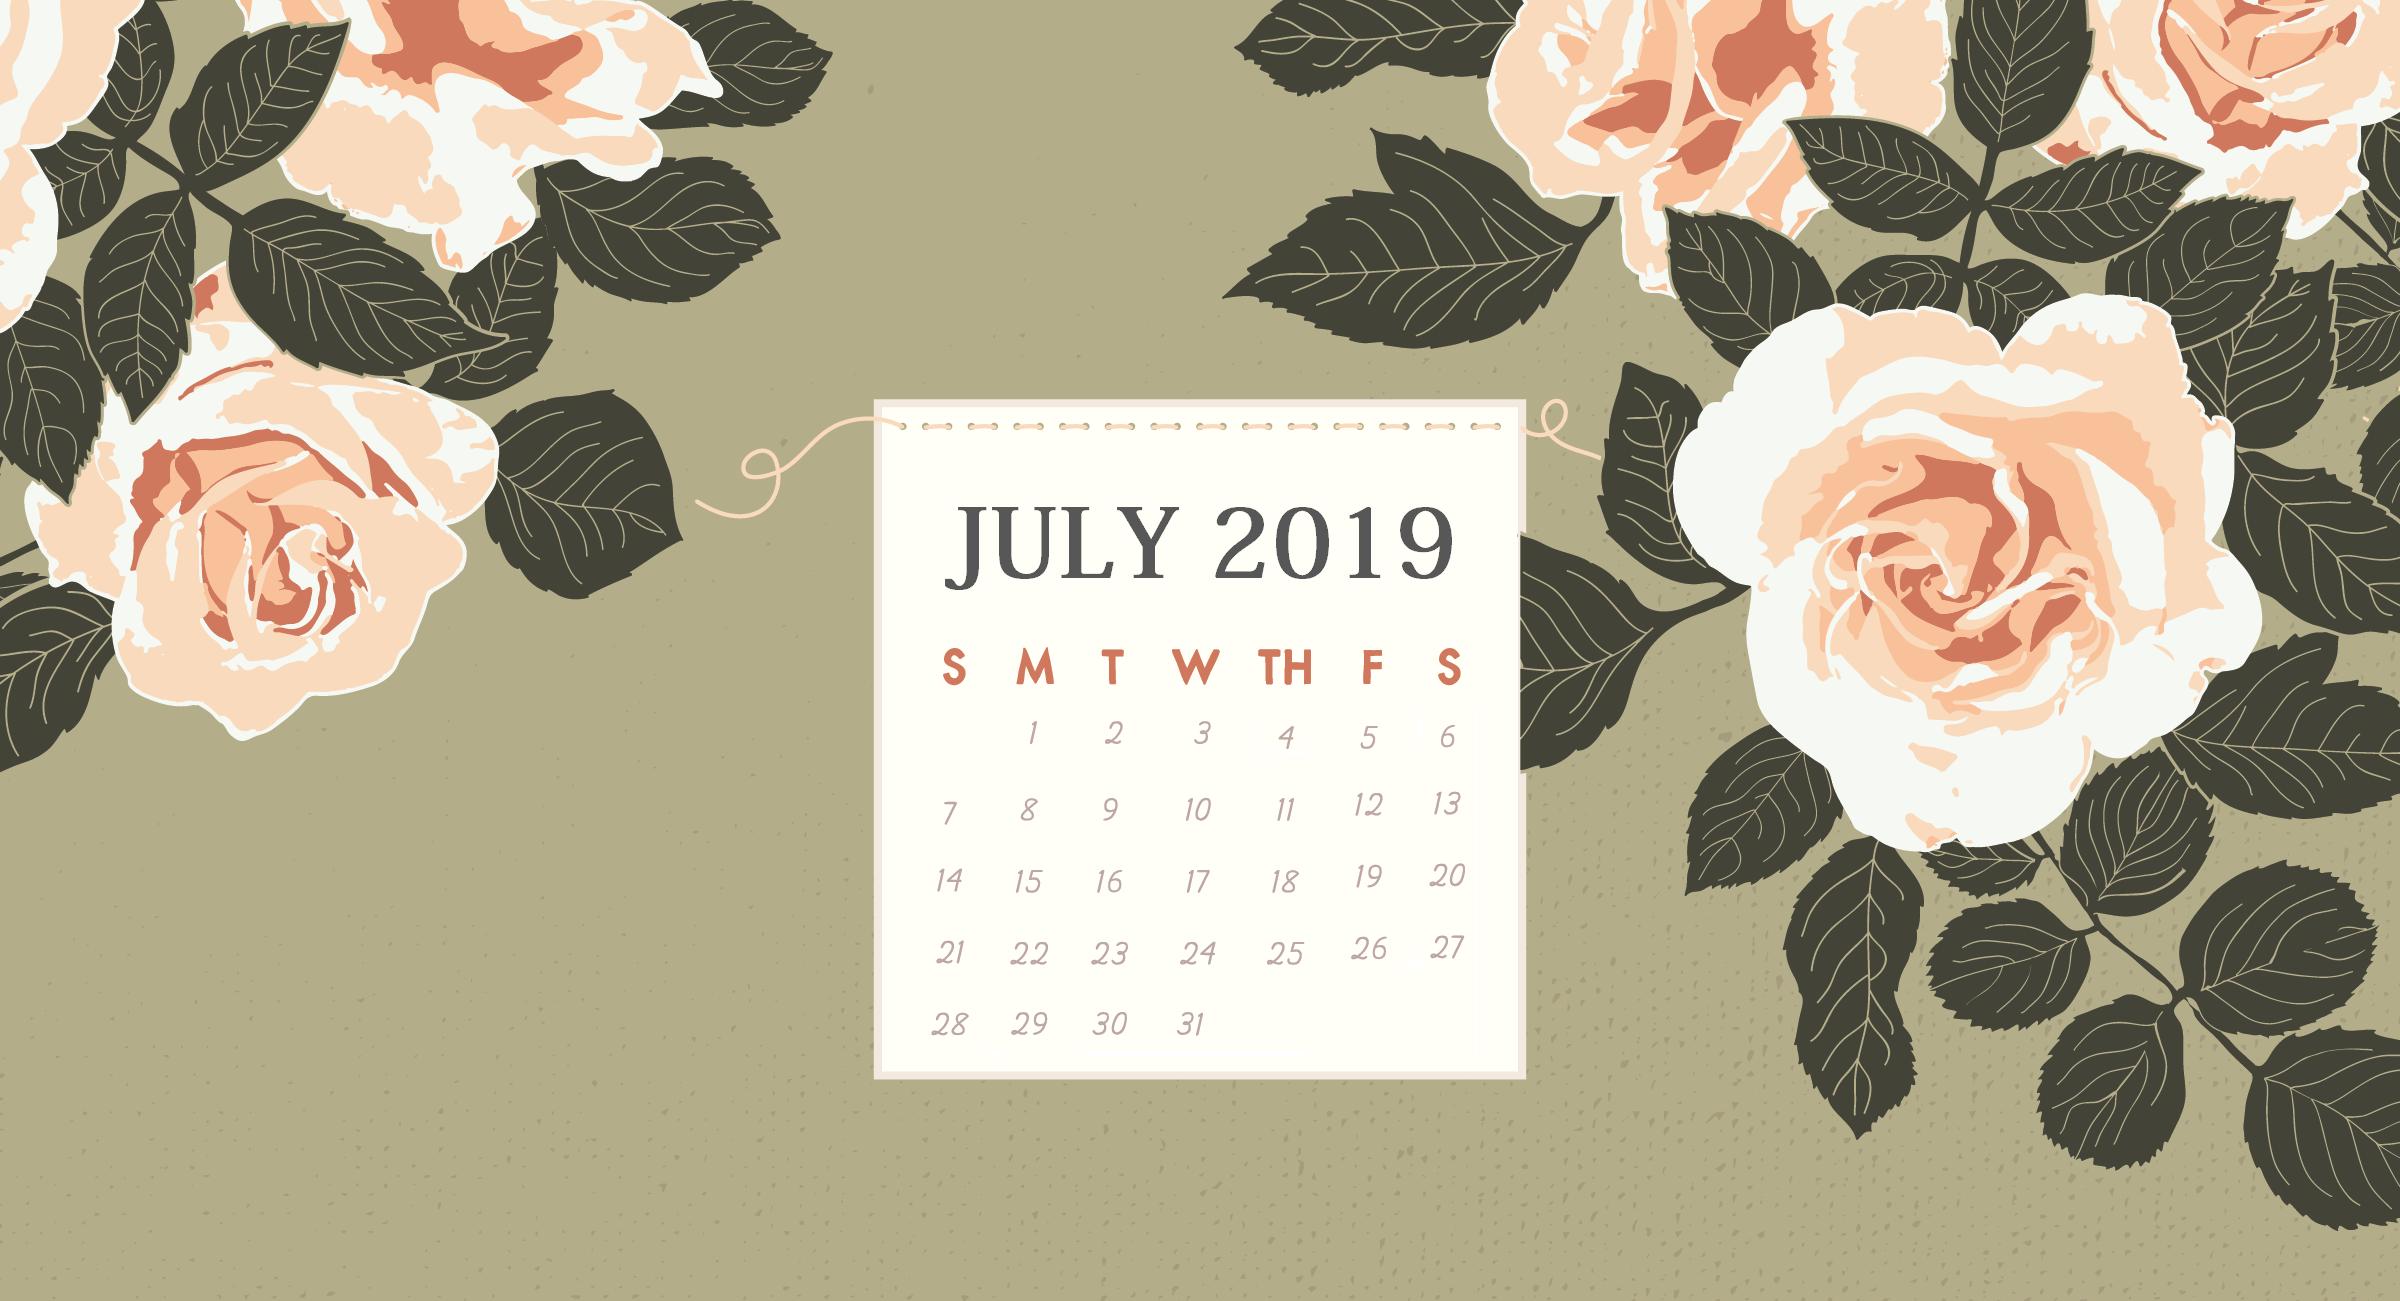 Floral July 2019 Desktop Calendar Wallpaper Calendar Wallpaper July Calendar Calendar Background